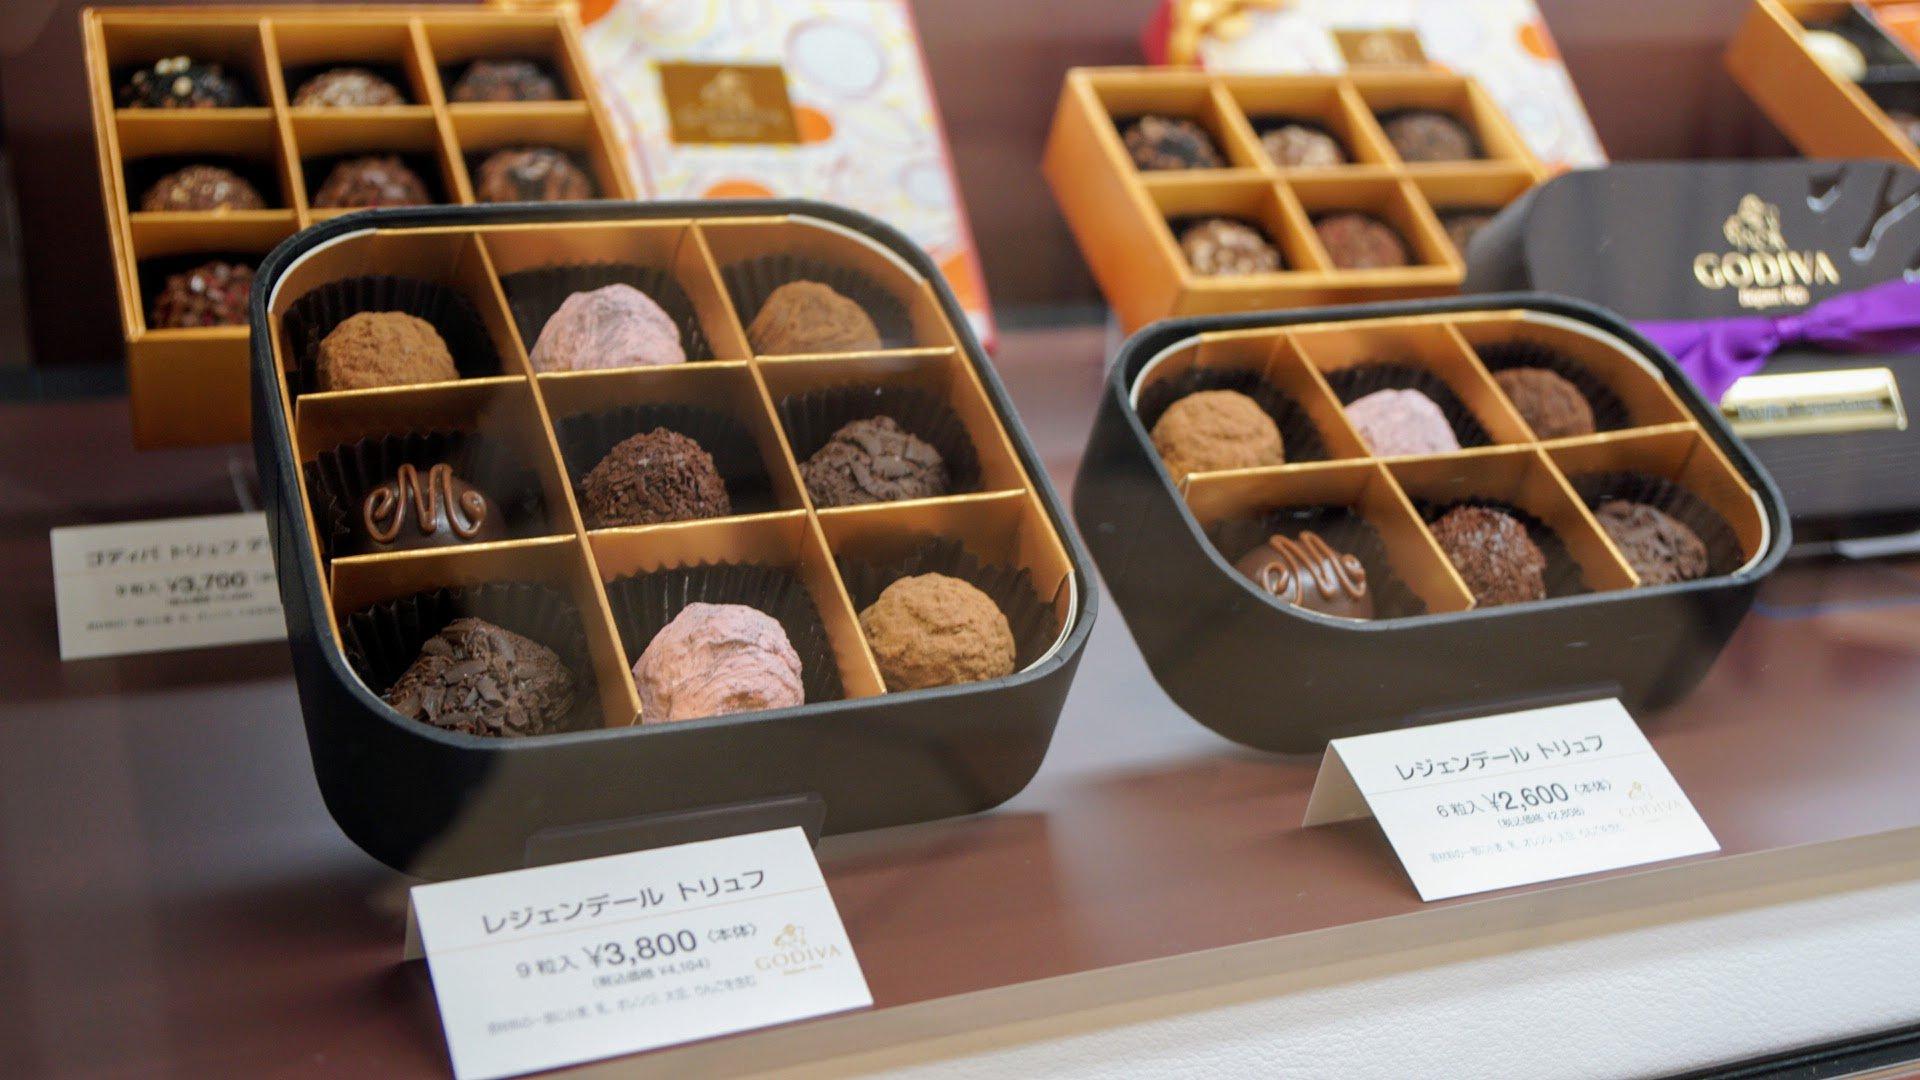 Godiva's dig at obligatory Valentine's chocolates stirs debate in Japan https://t.co/EwJlIo9LjY https://t.co/IxL9WHfLZG